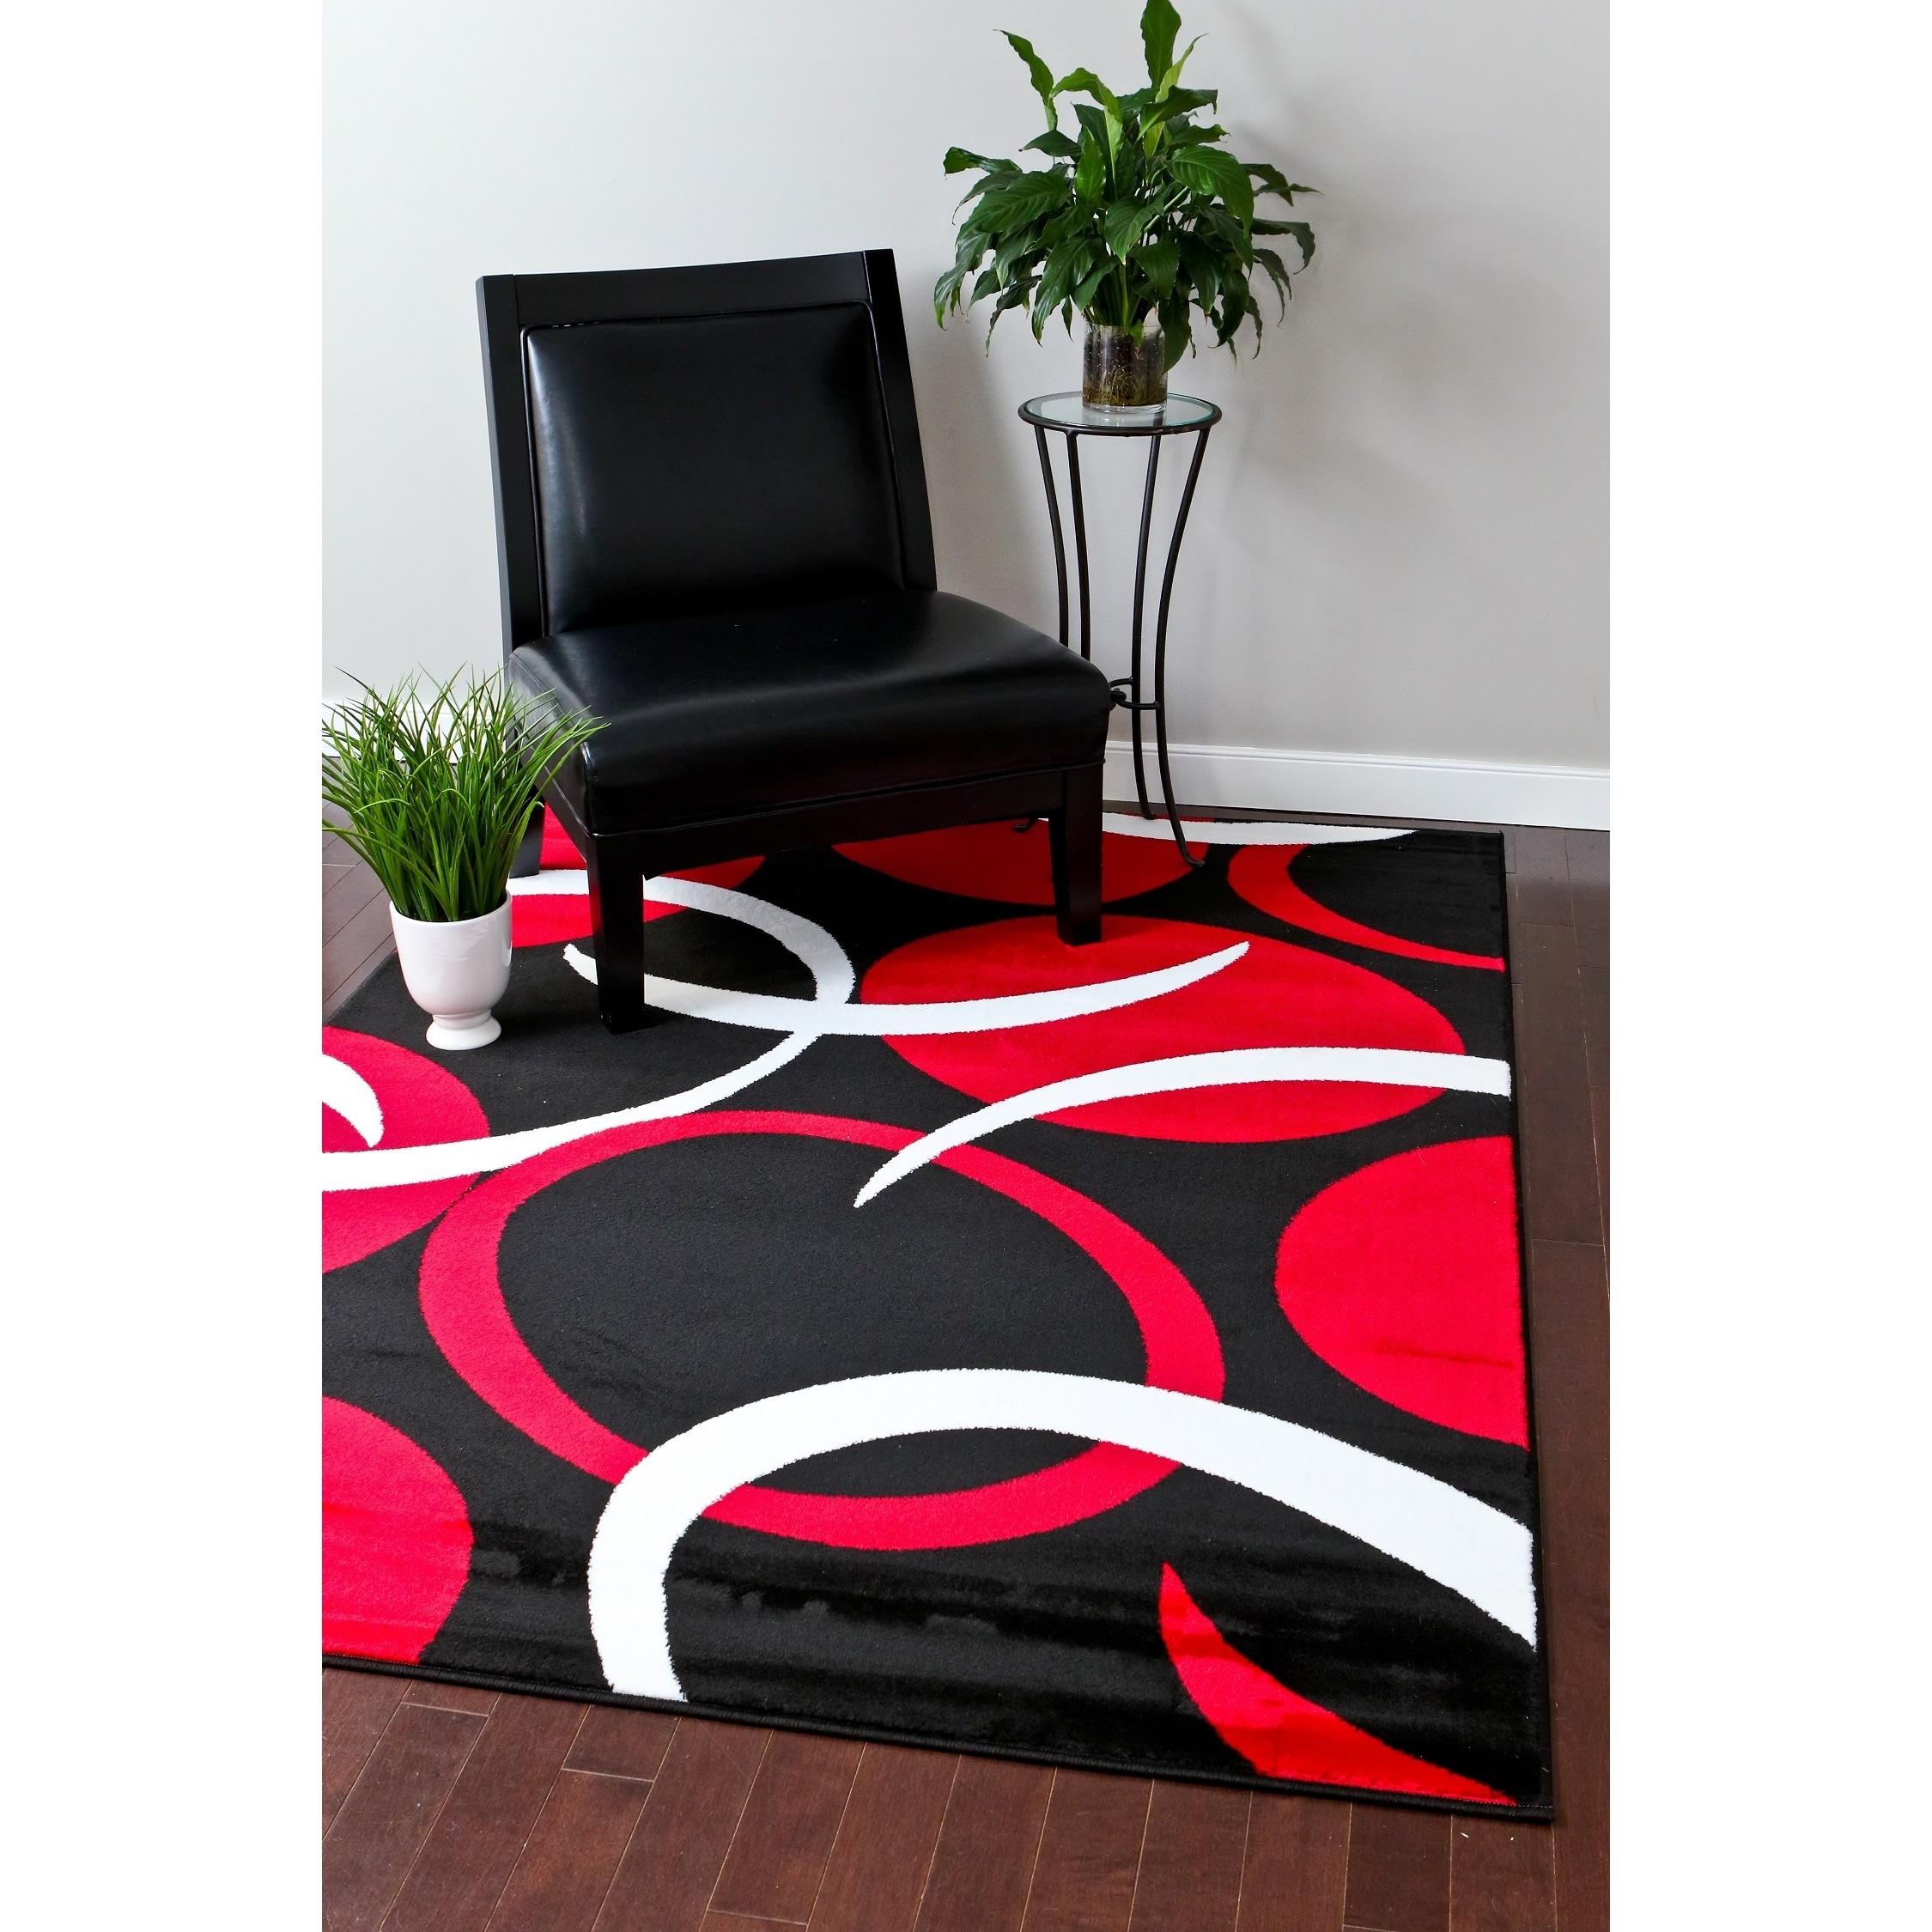 Avalon Organic Persian Rugs Modern Trendz Red/ White/ Bla...